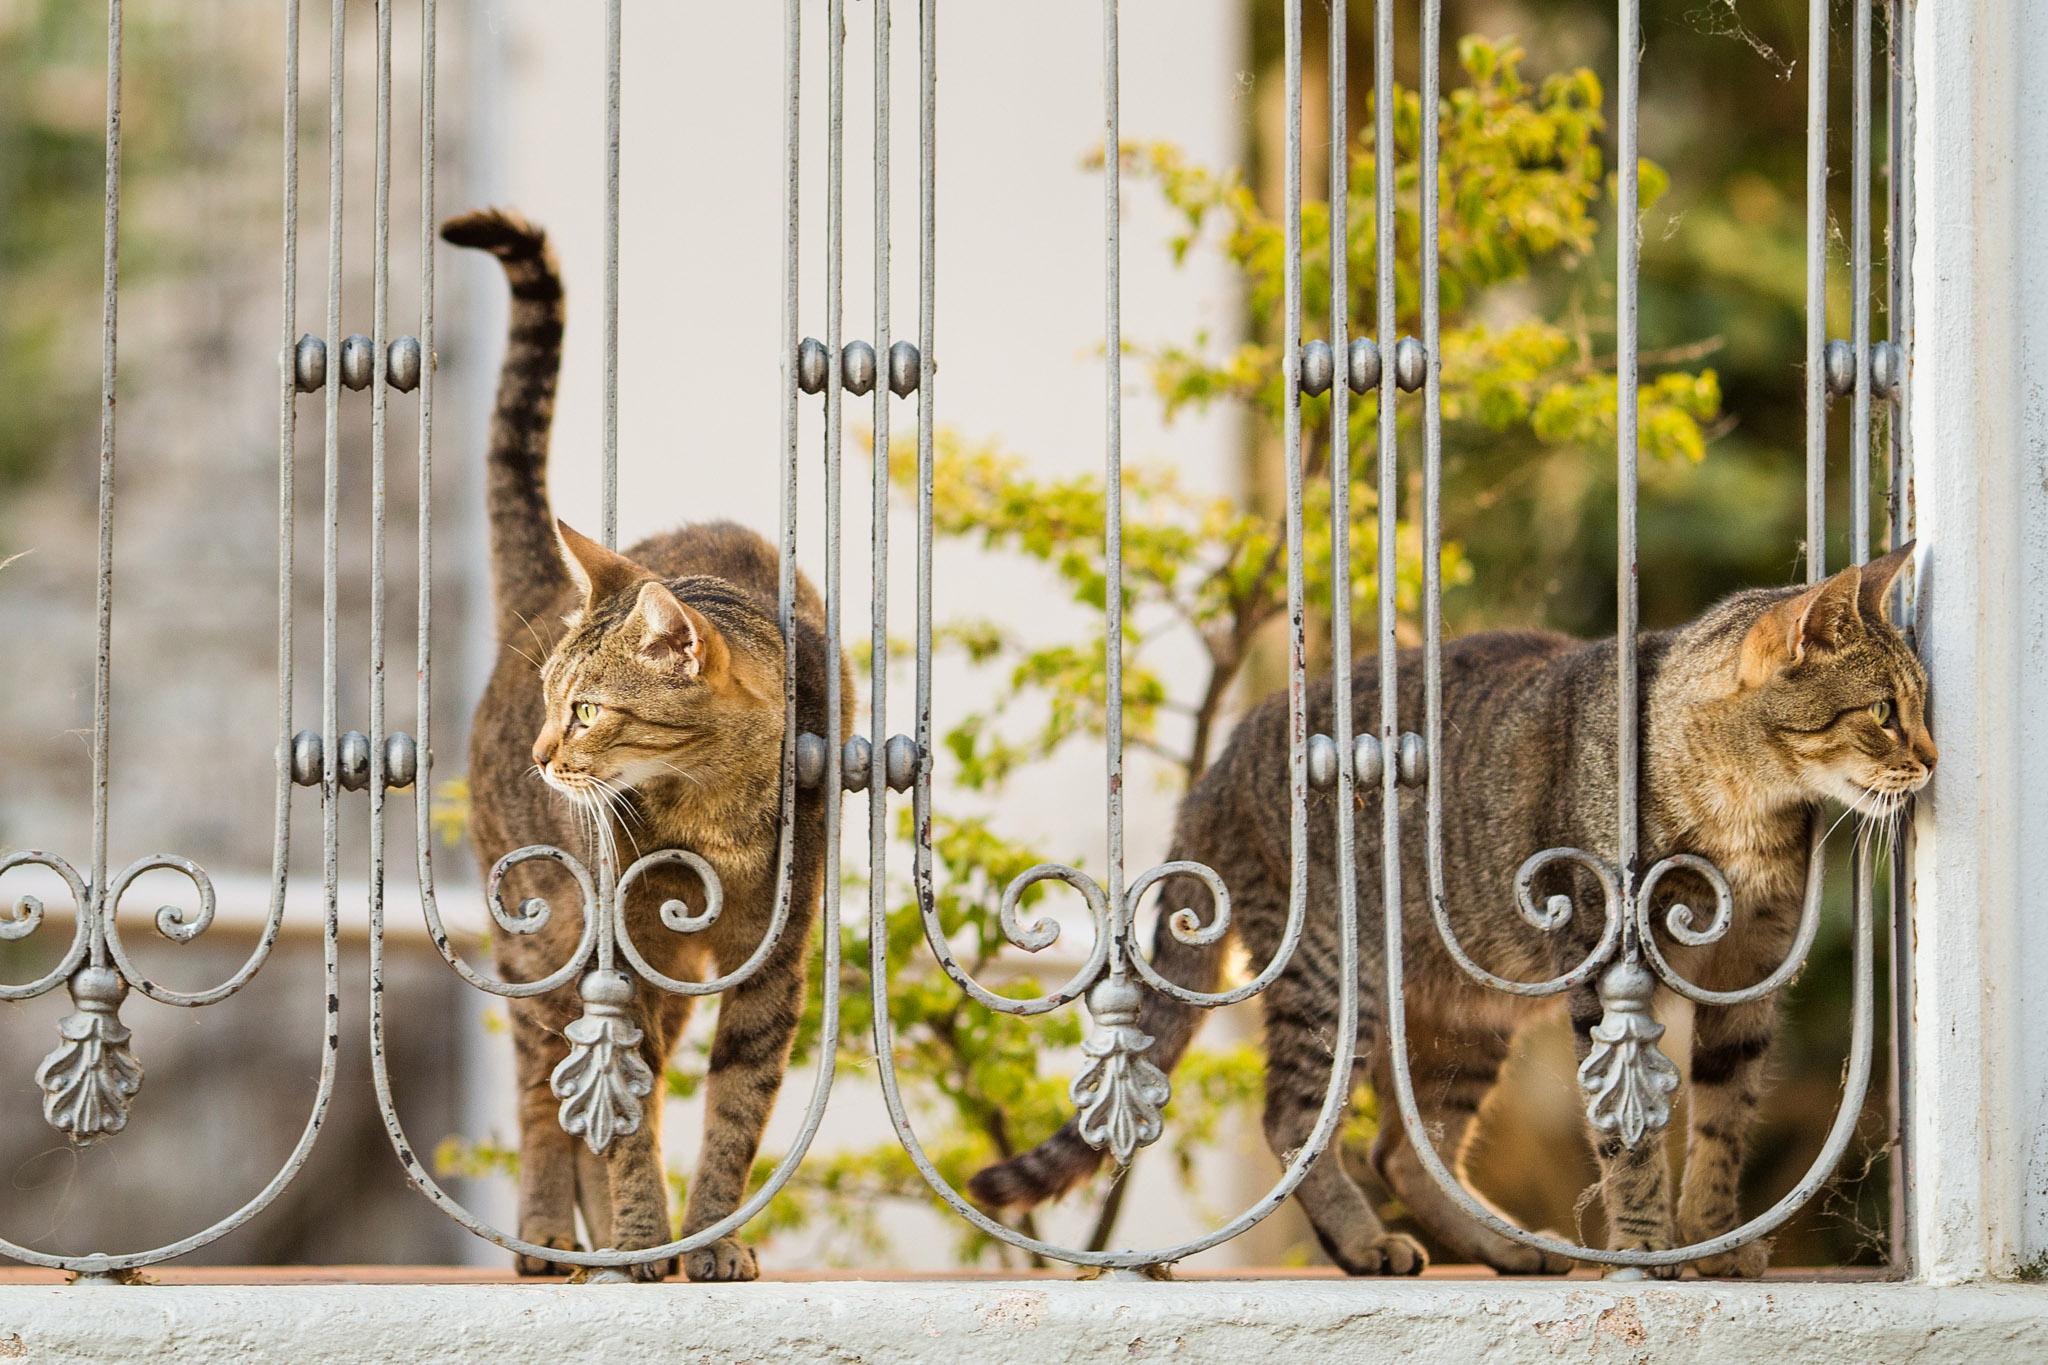 wedding-travellers-destination-photography-overlanding-south-america-uruguay-colonia-del-sacramento-cats-cute-tiger